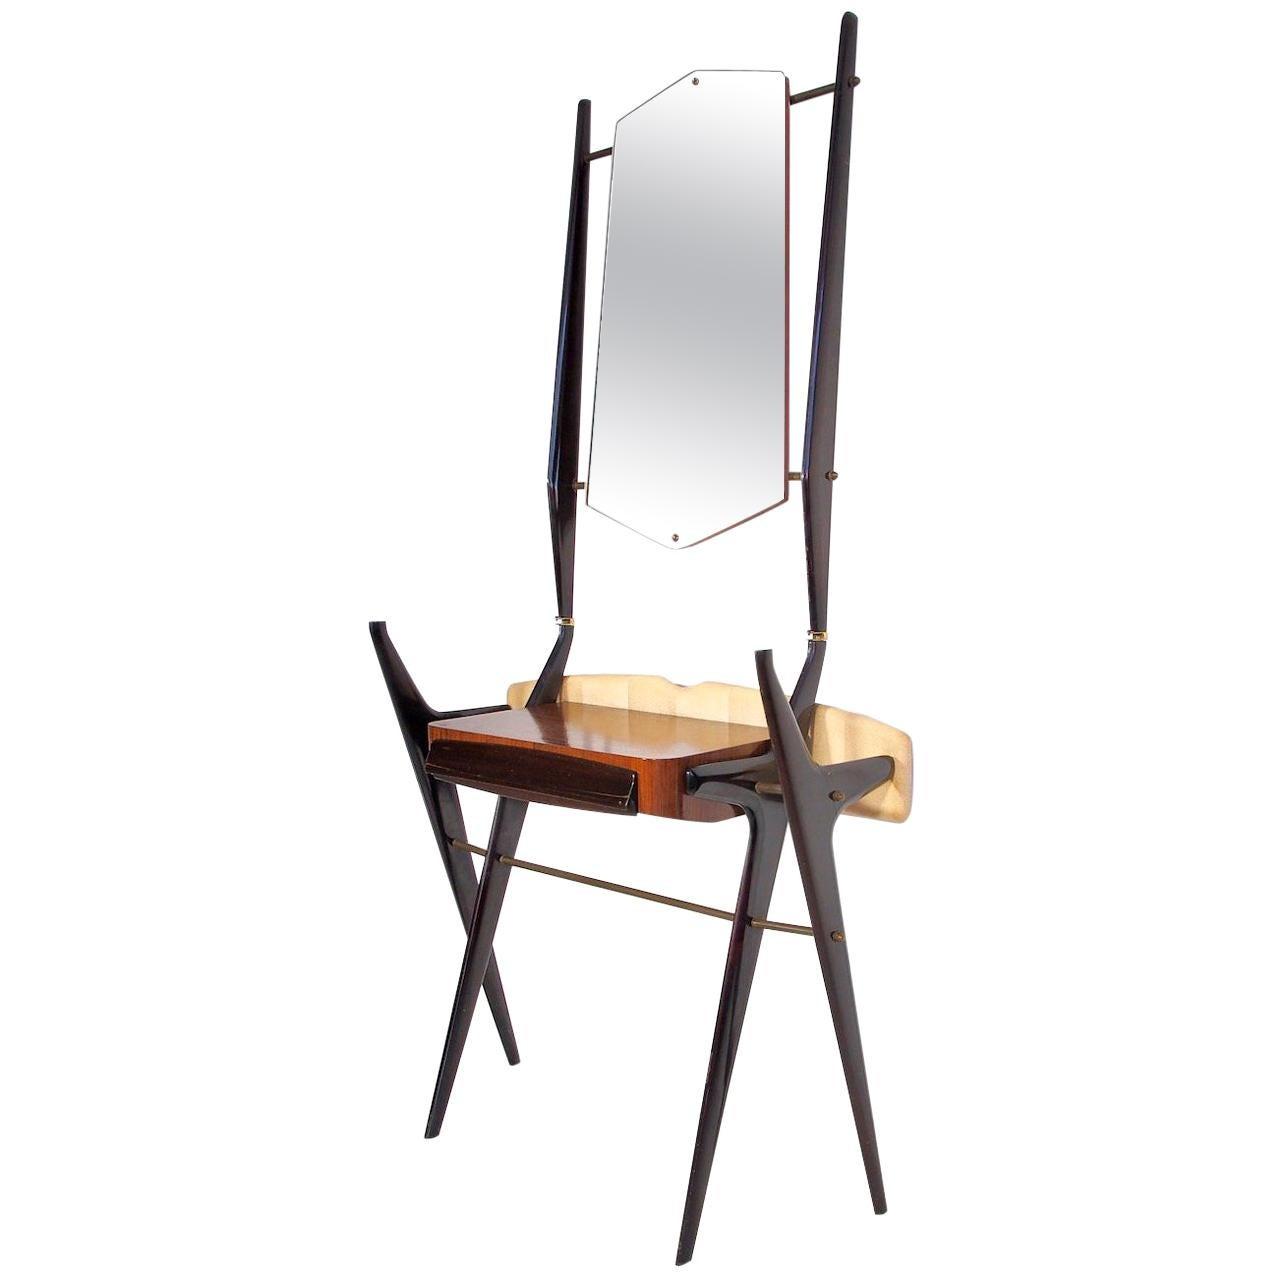 Midcentury Italian Vanity Table with Mirror